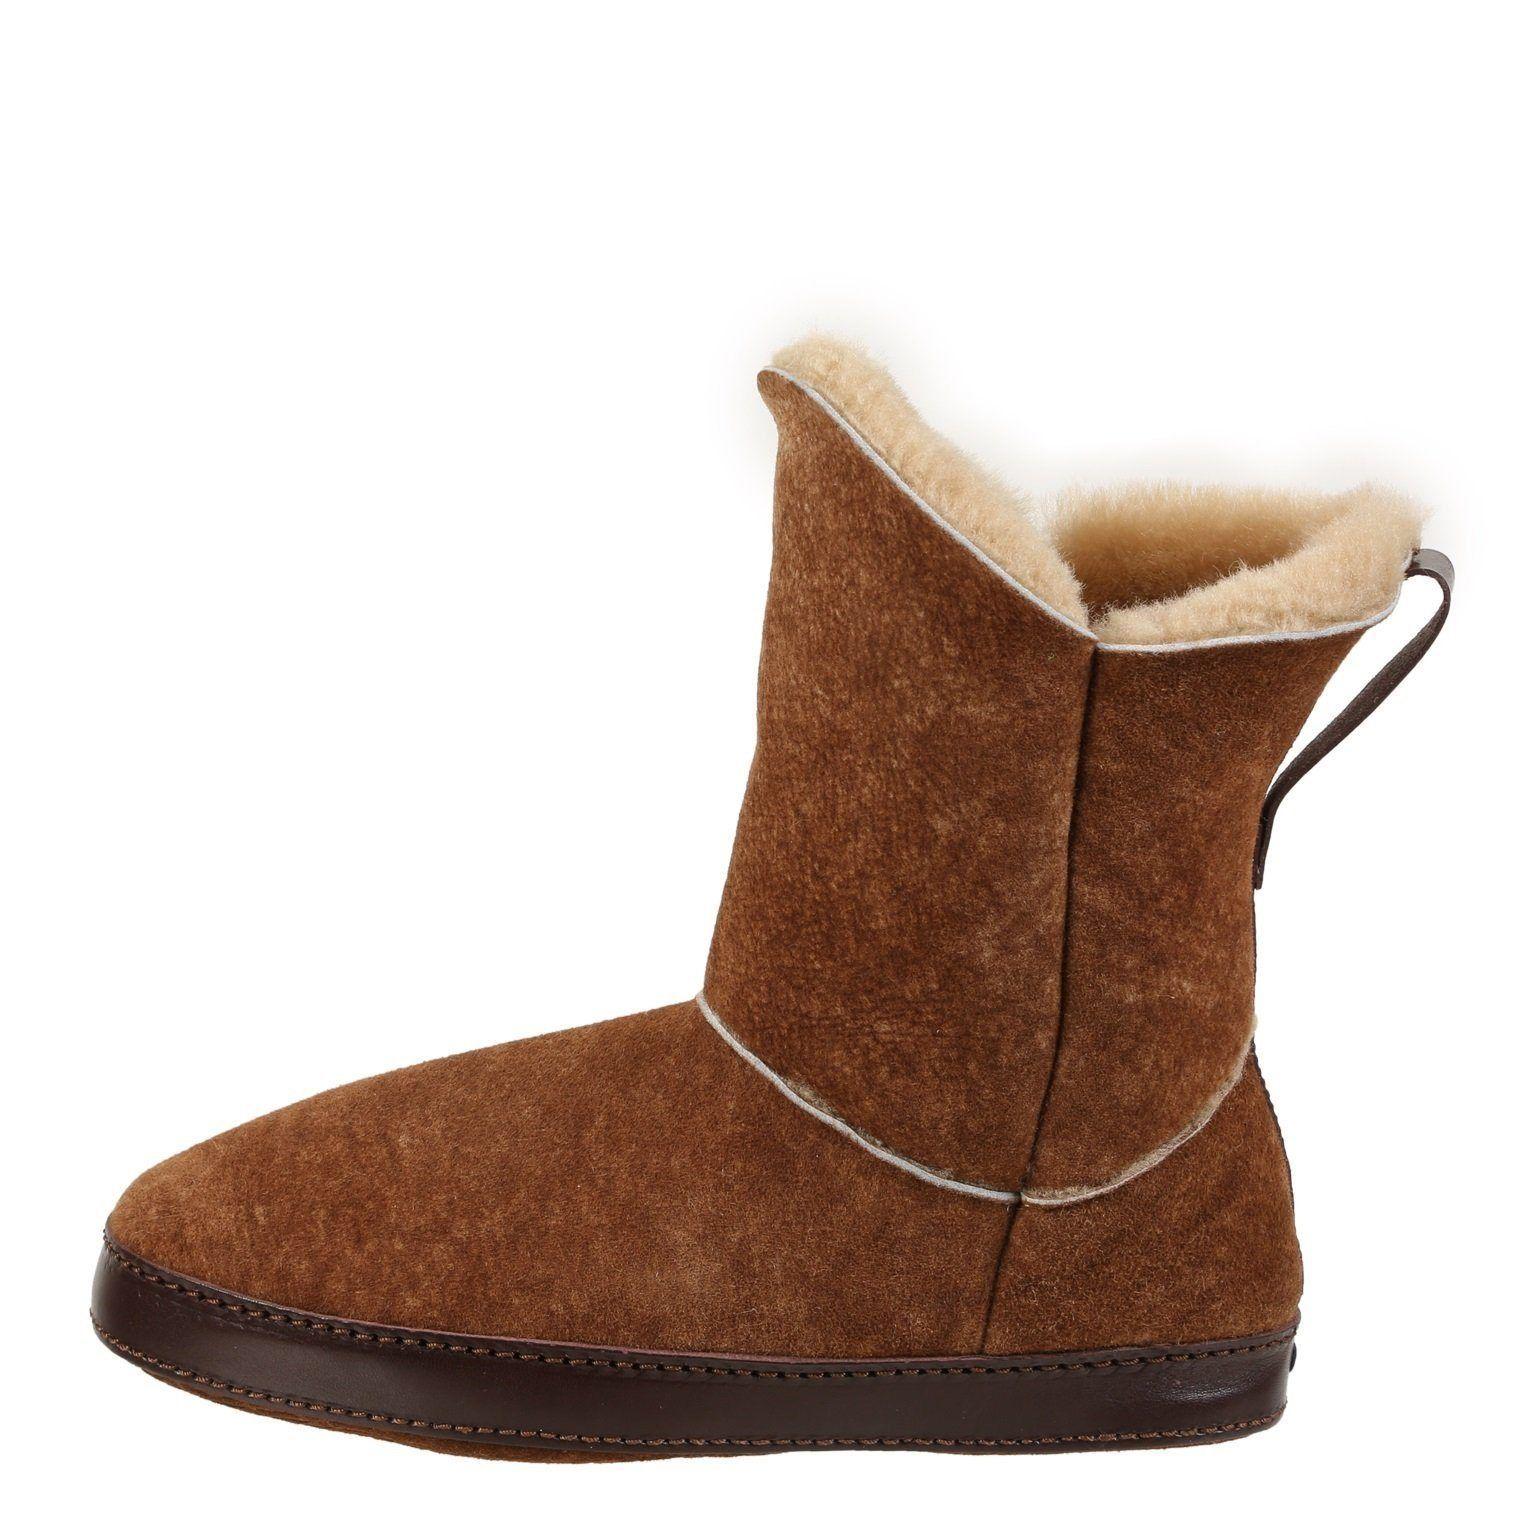 Gemma Stone Washed Cognac Slipper Boot - 9